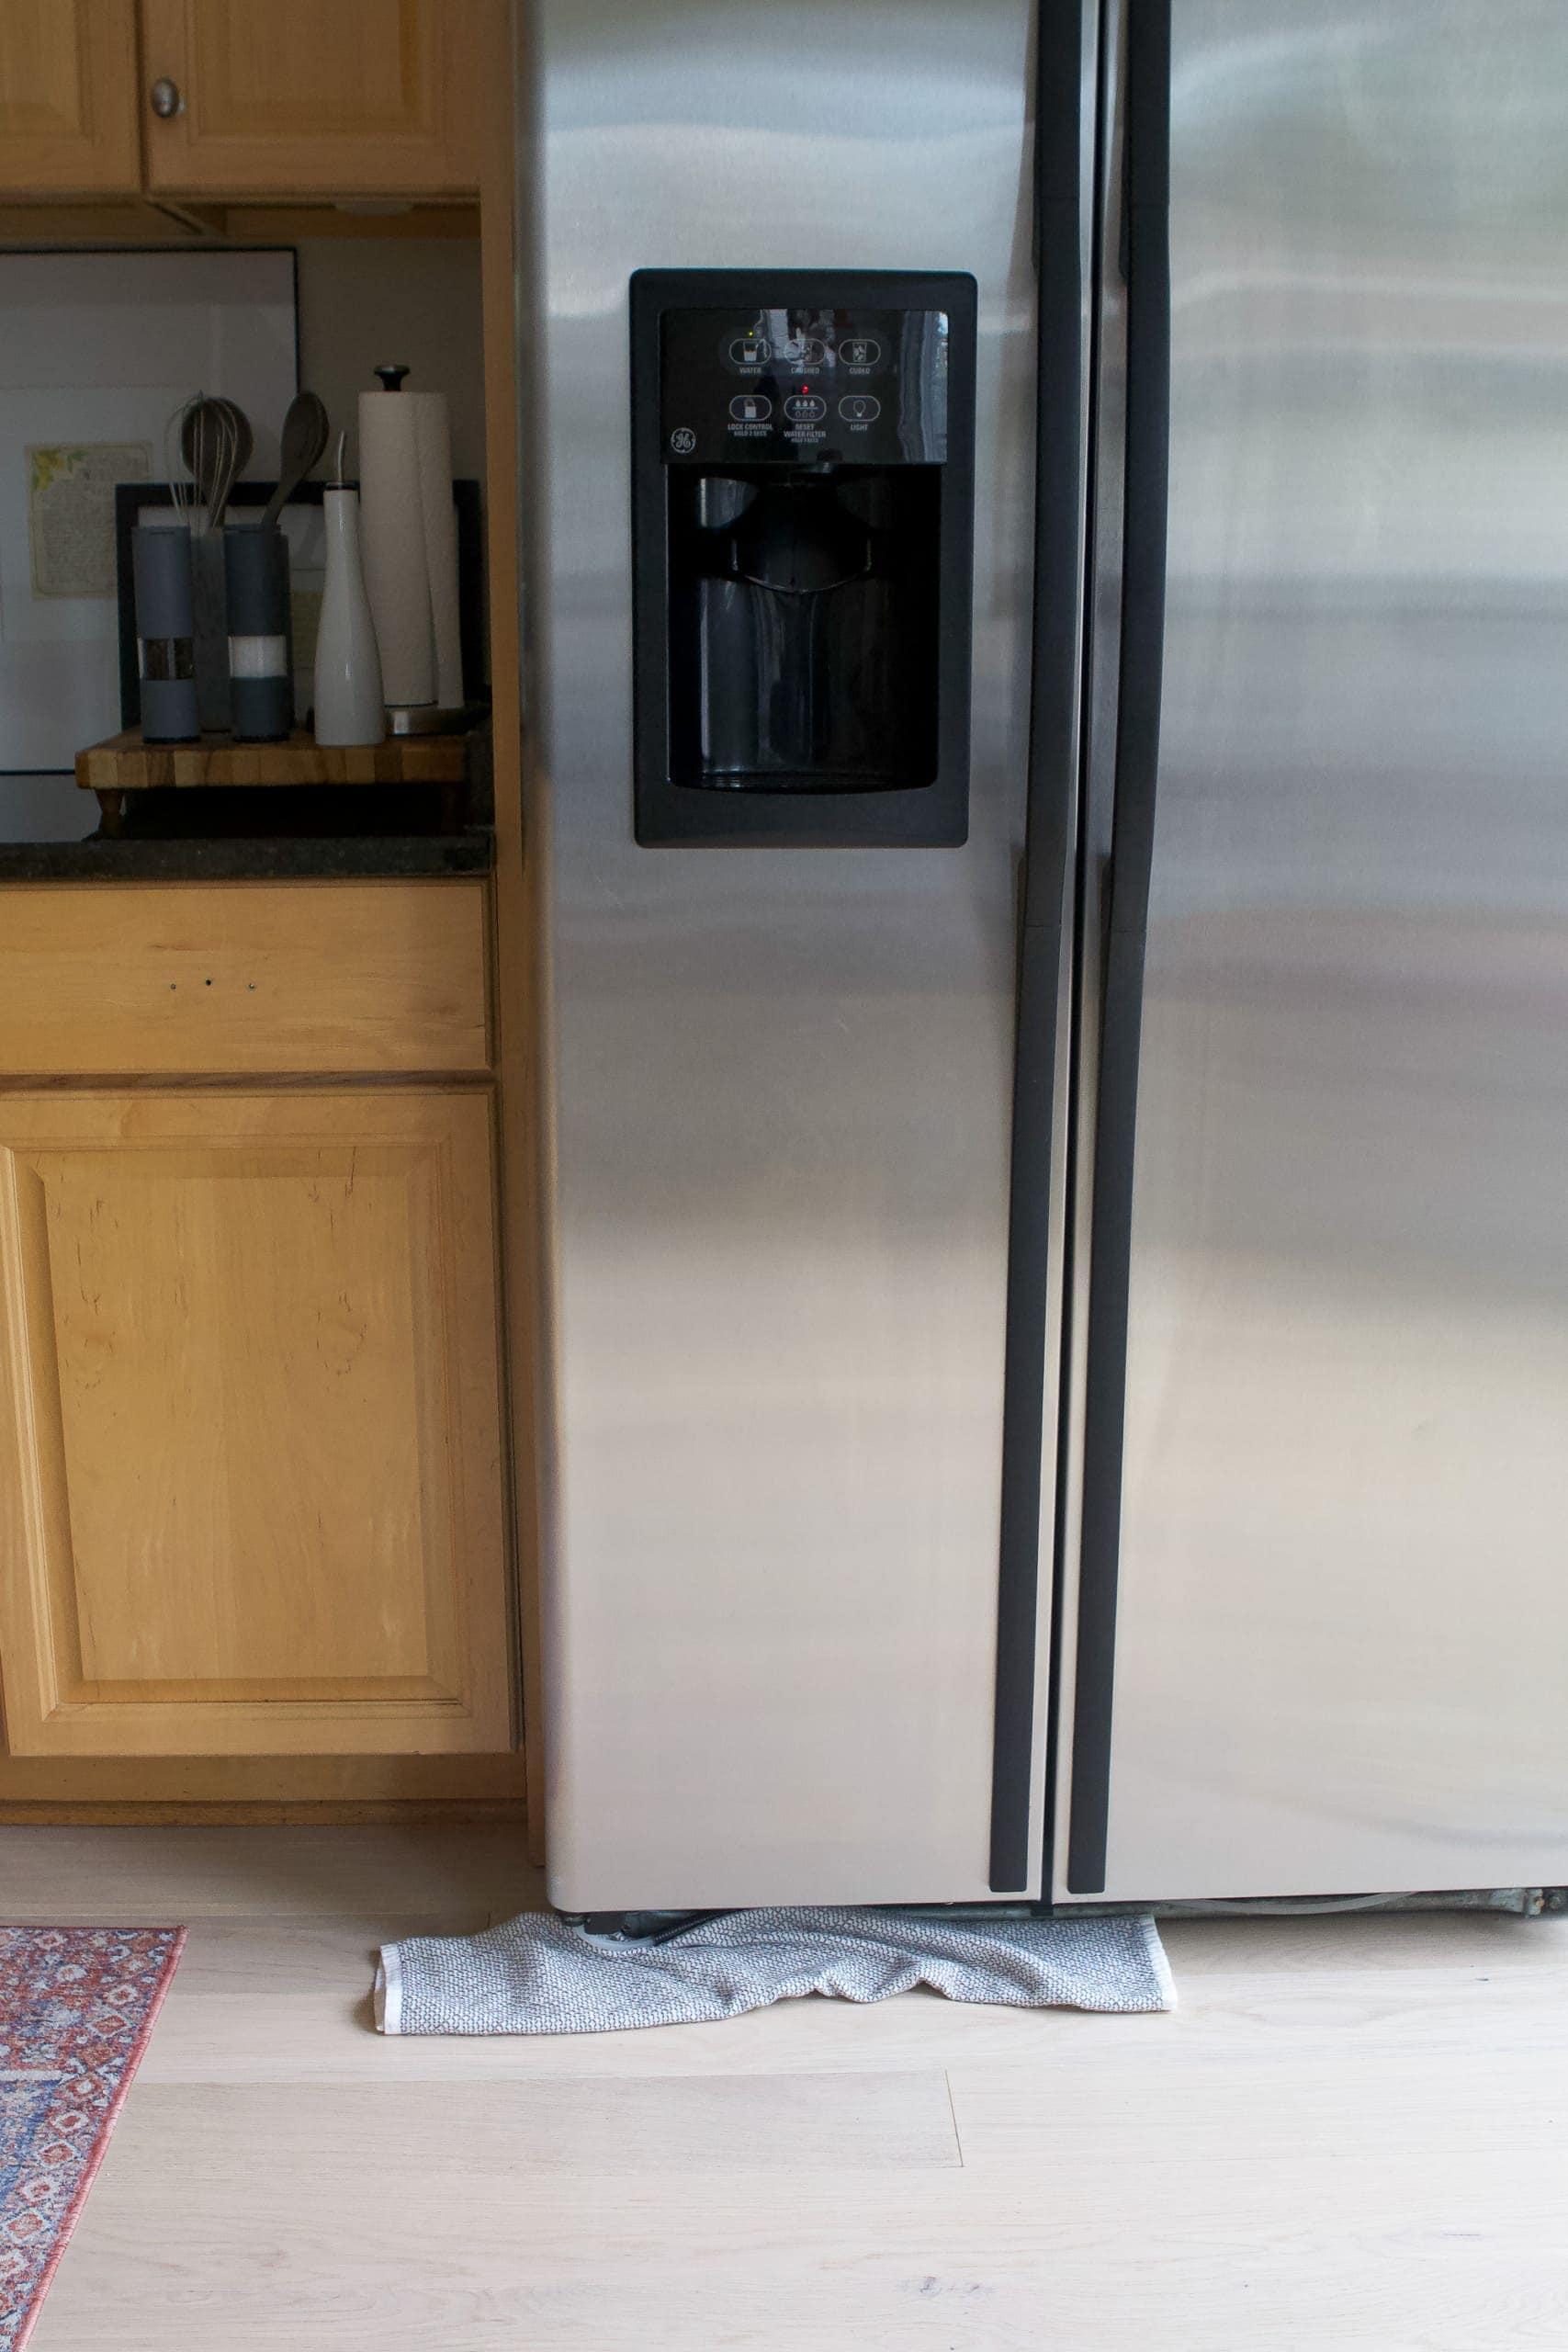 Our leaky fridge